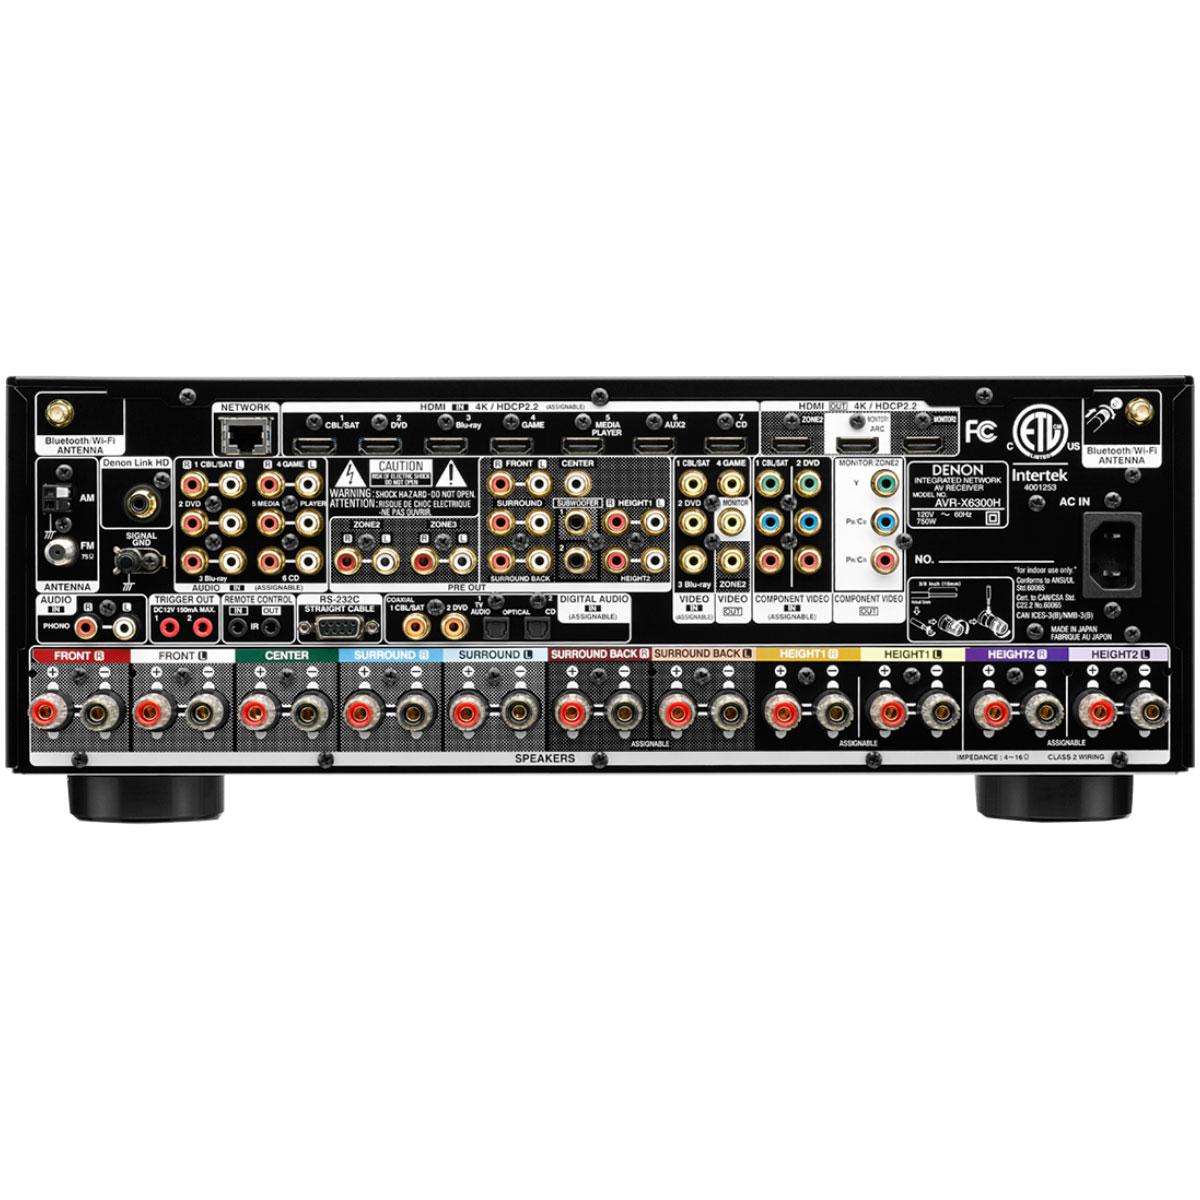 Receiver 11.2 Canais c/ 8 HDMI / WIFI / Bluetooth / 4K - AVR X 6300 Denon